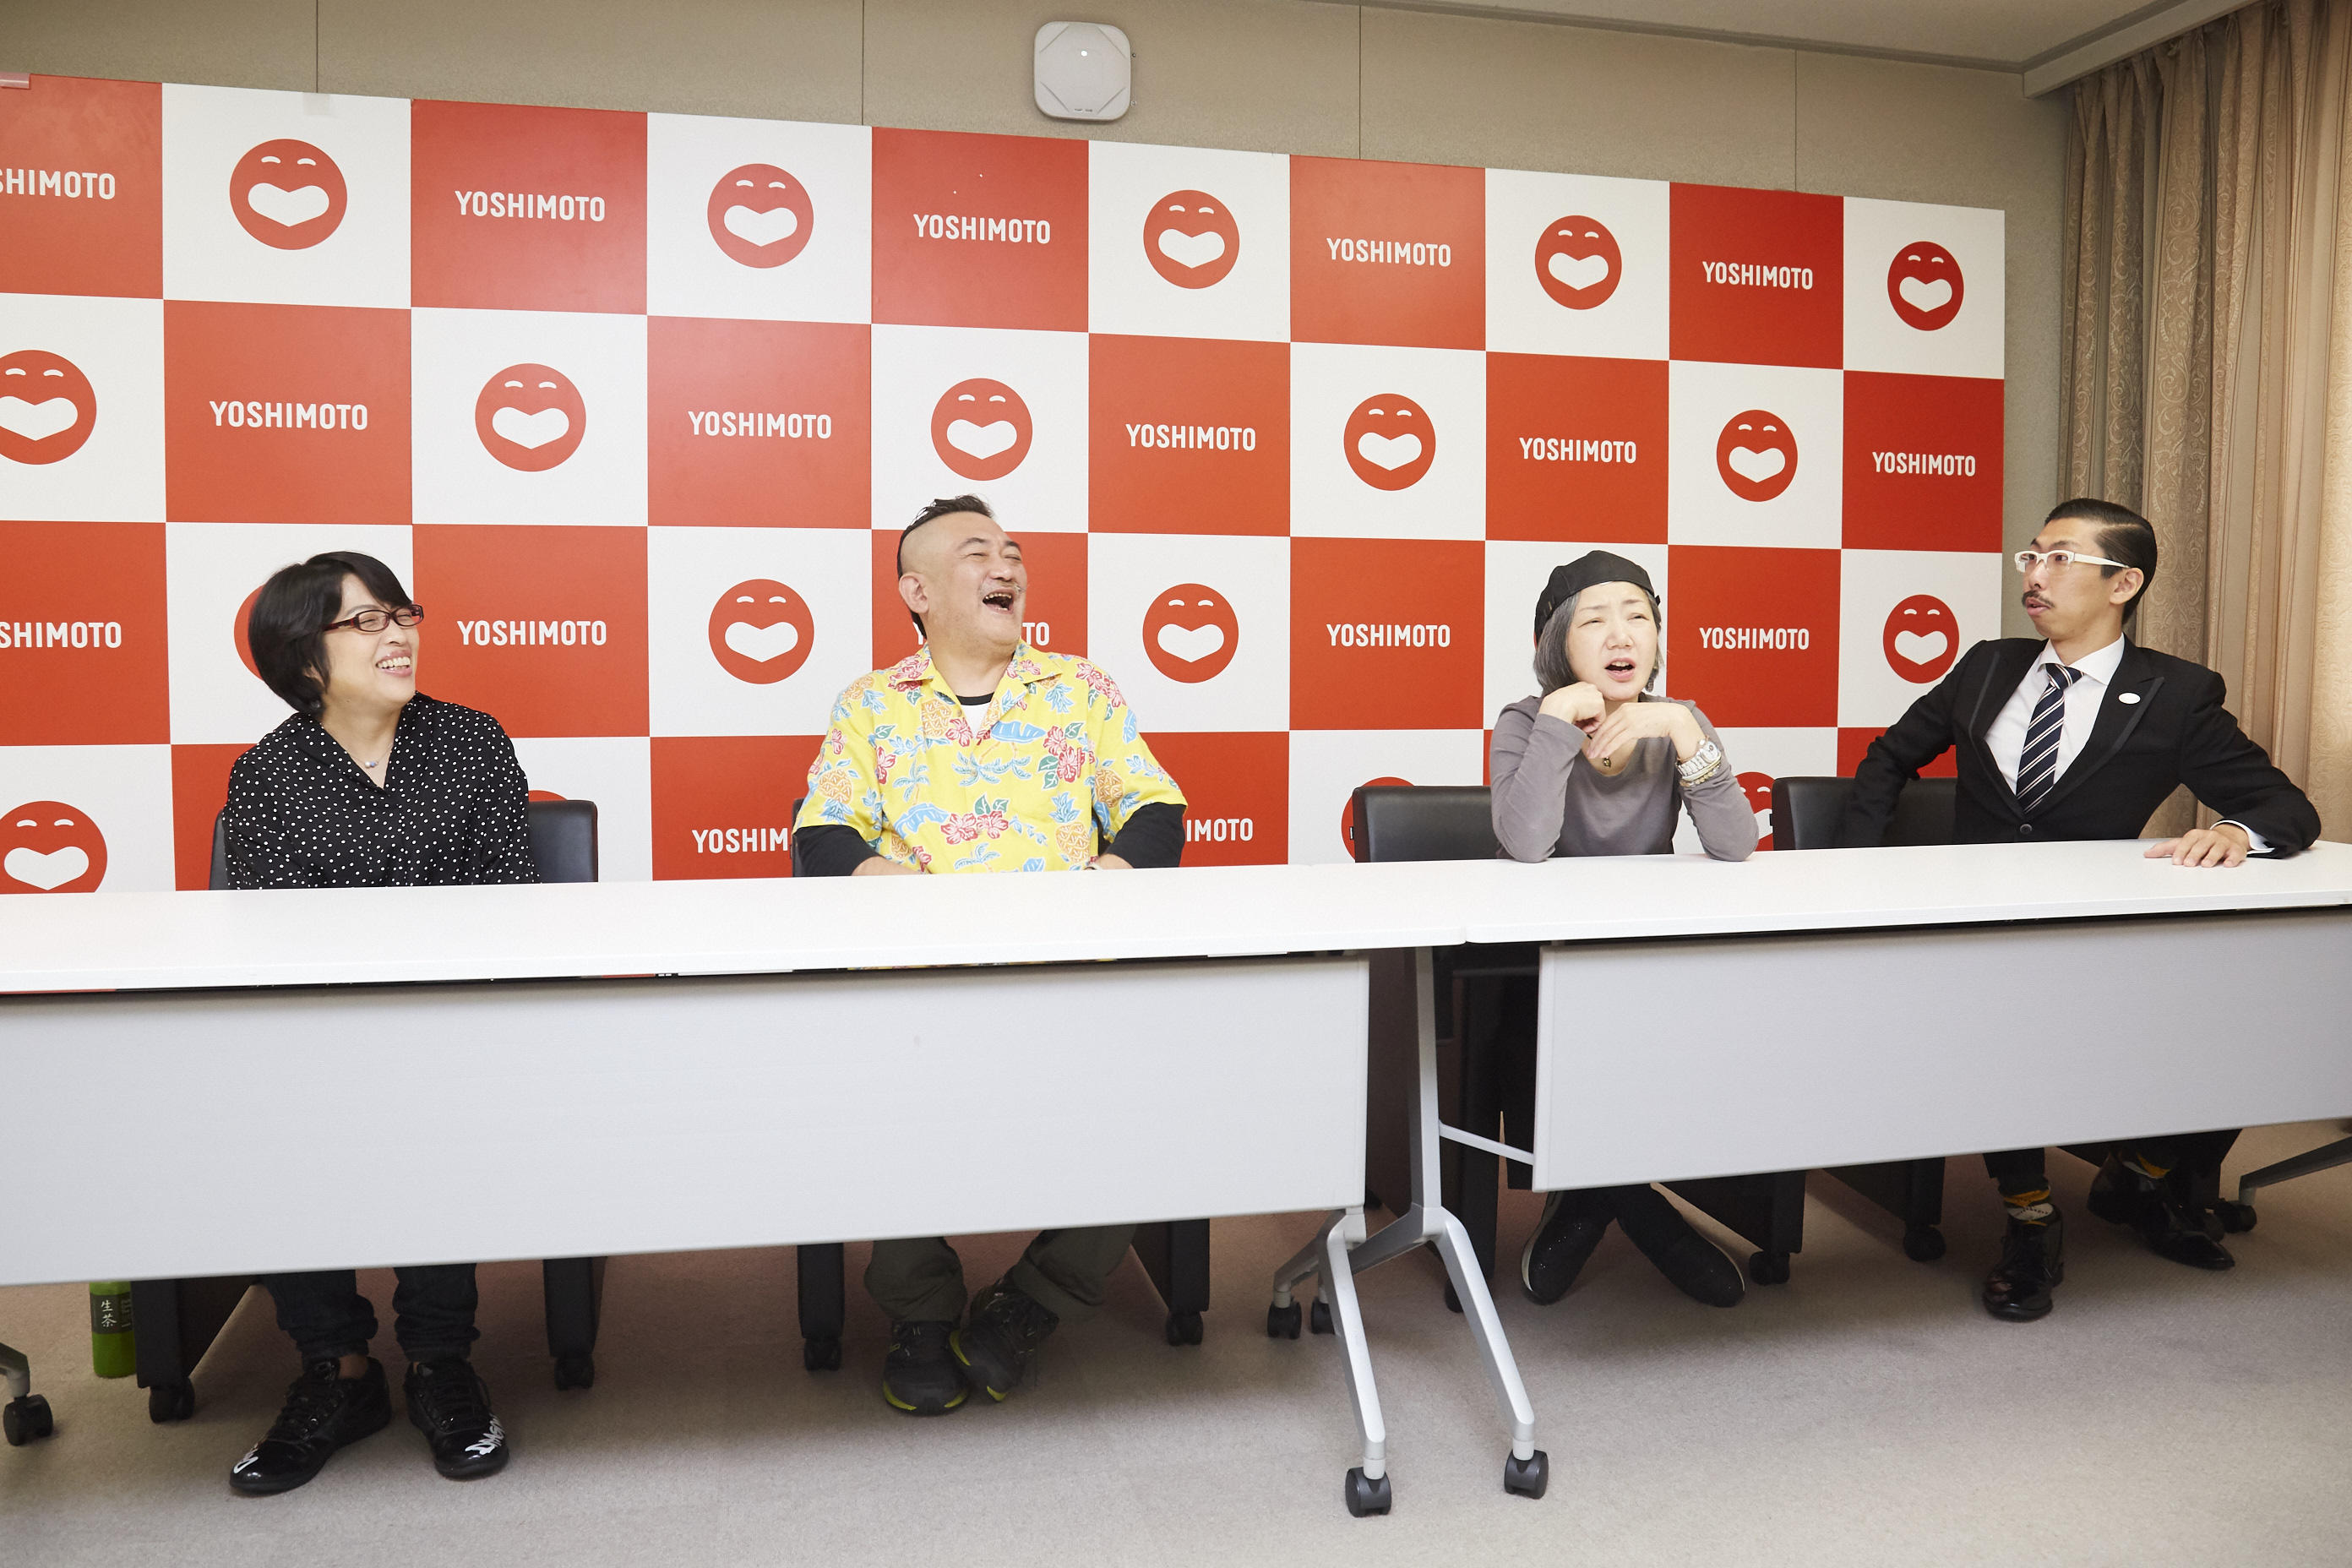 http://news.yoshimoto.co.jp/20181004234635-ab64b5c76bb11aa63416c8d448239283336b1147.jpg